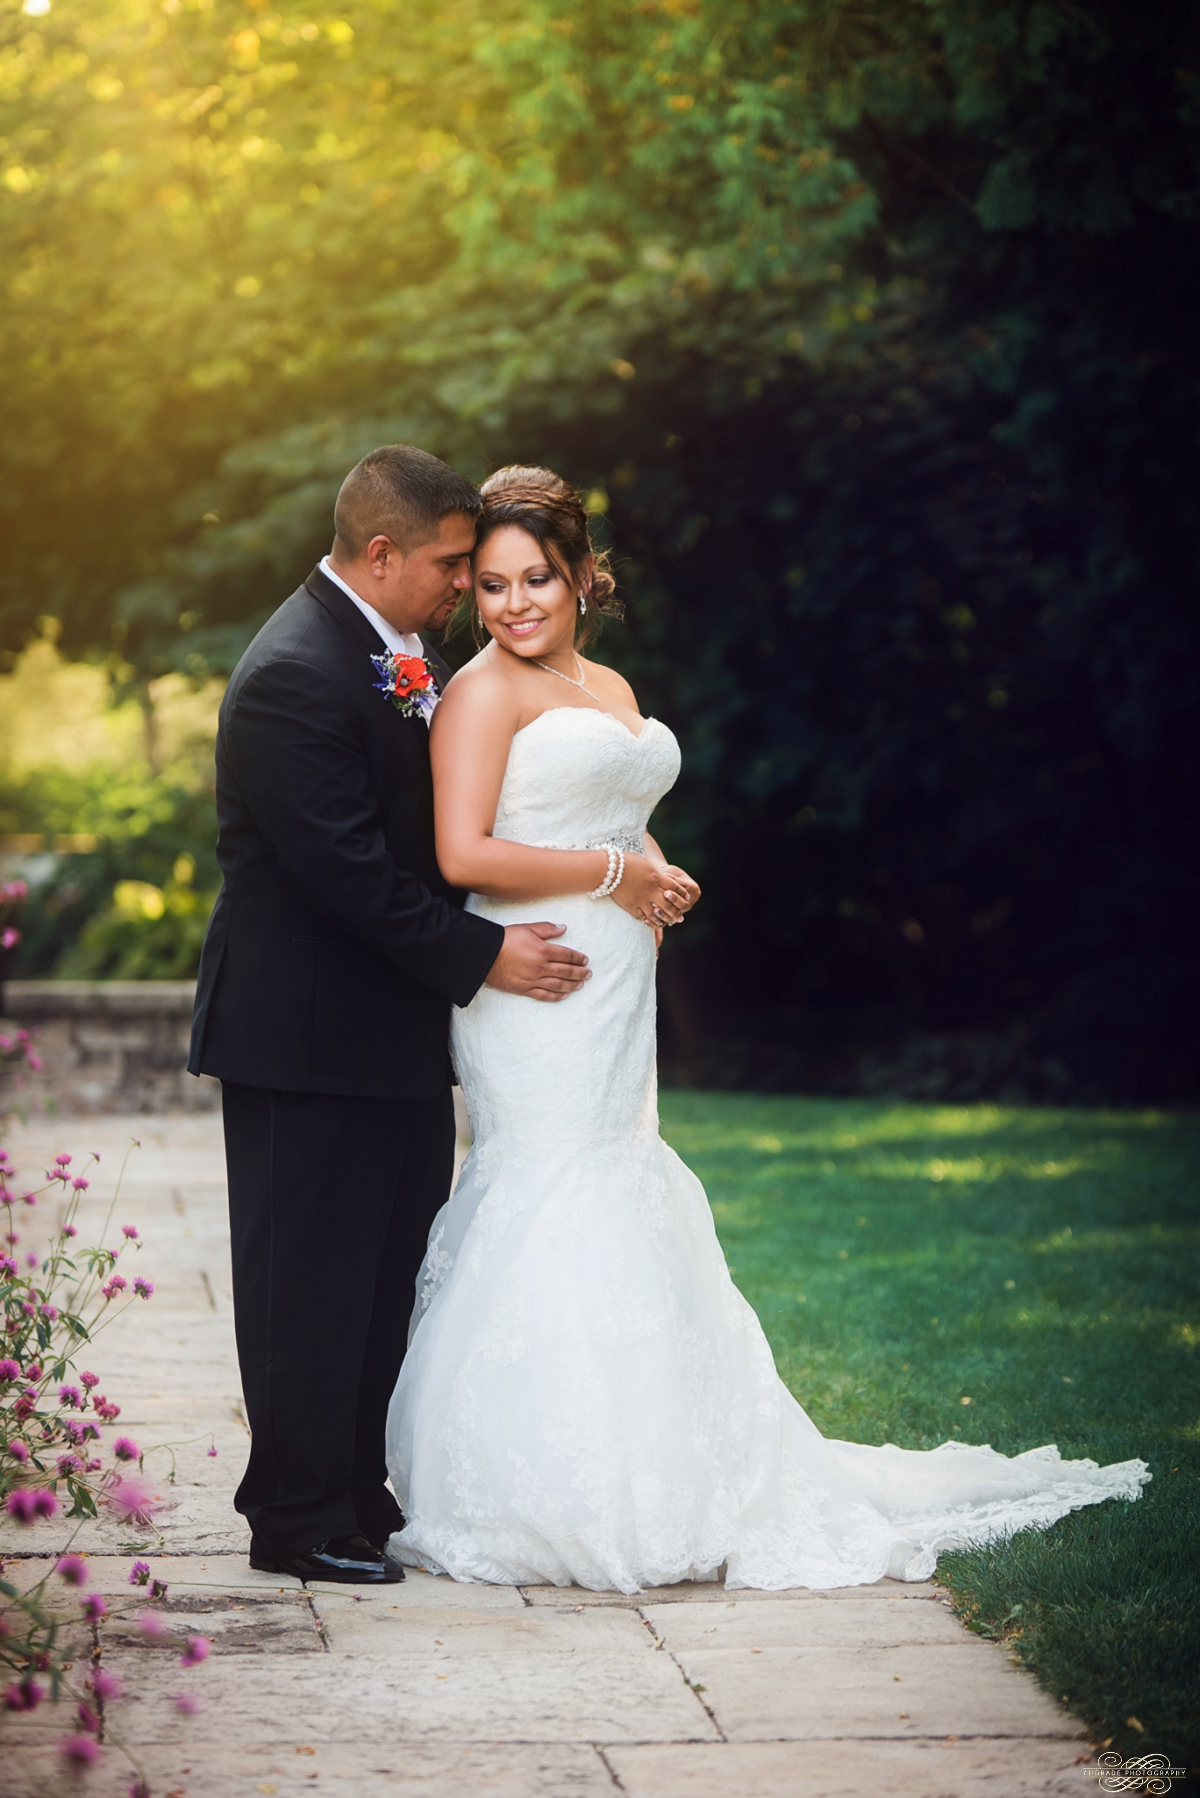 Janette + Louie Estebans Wedding Photography in Naperville - Naperville Wedding Photographer_0053.jpg